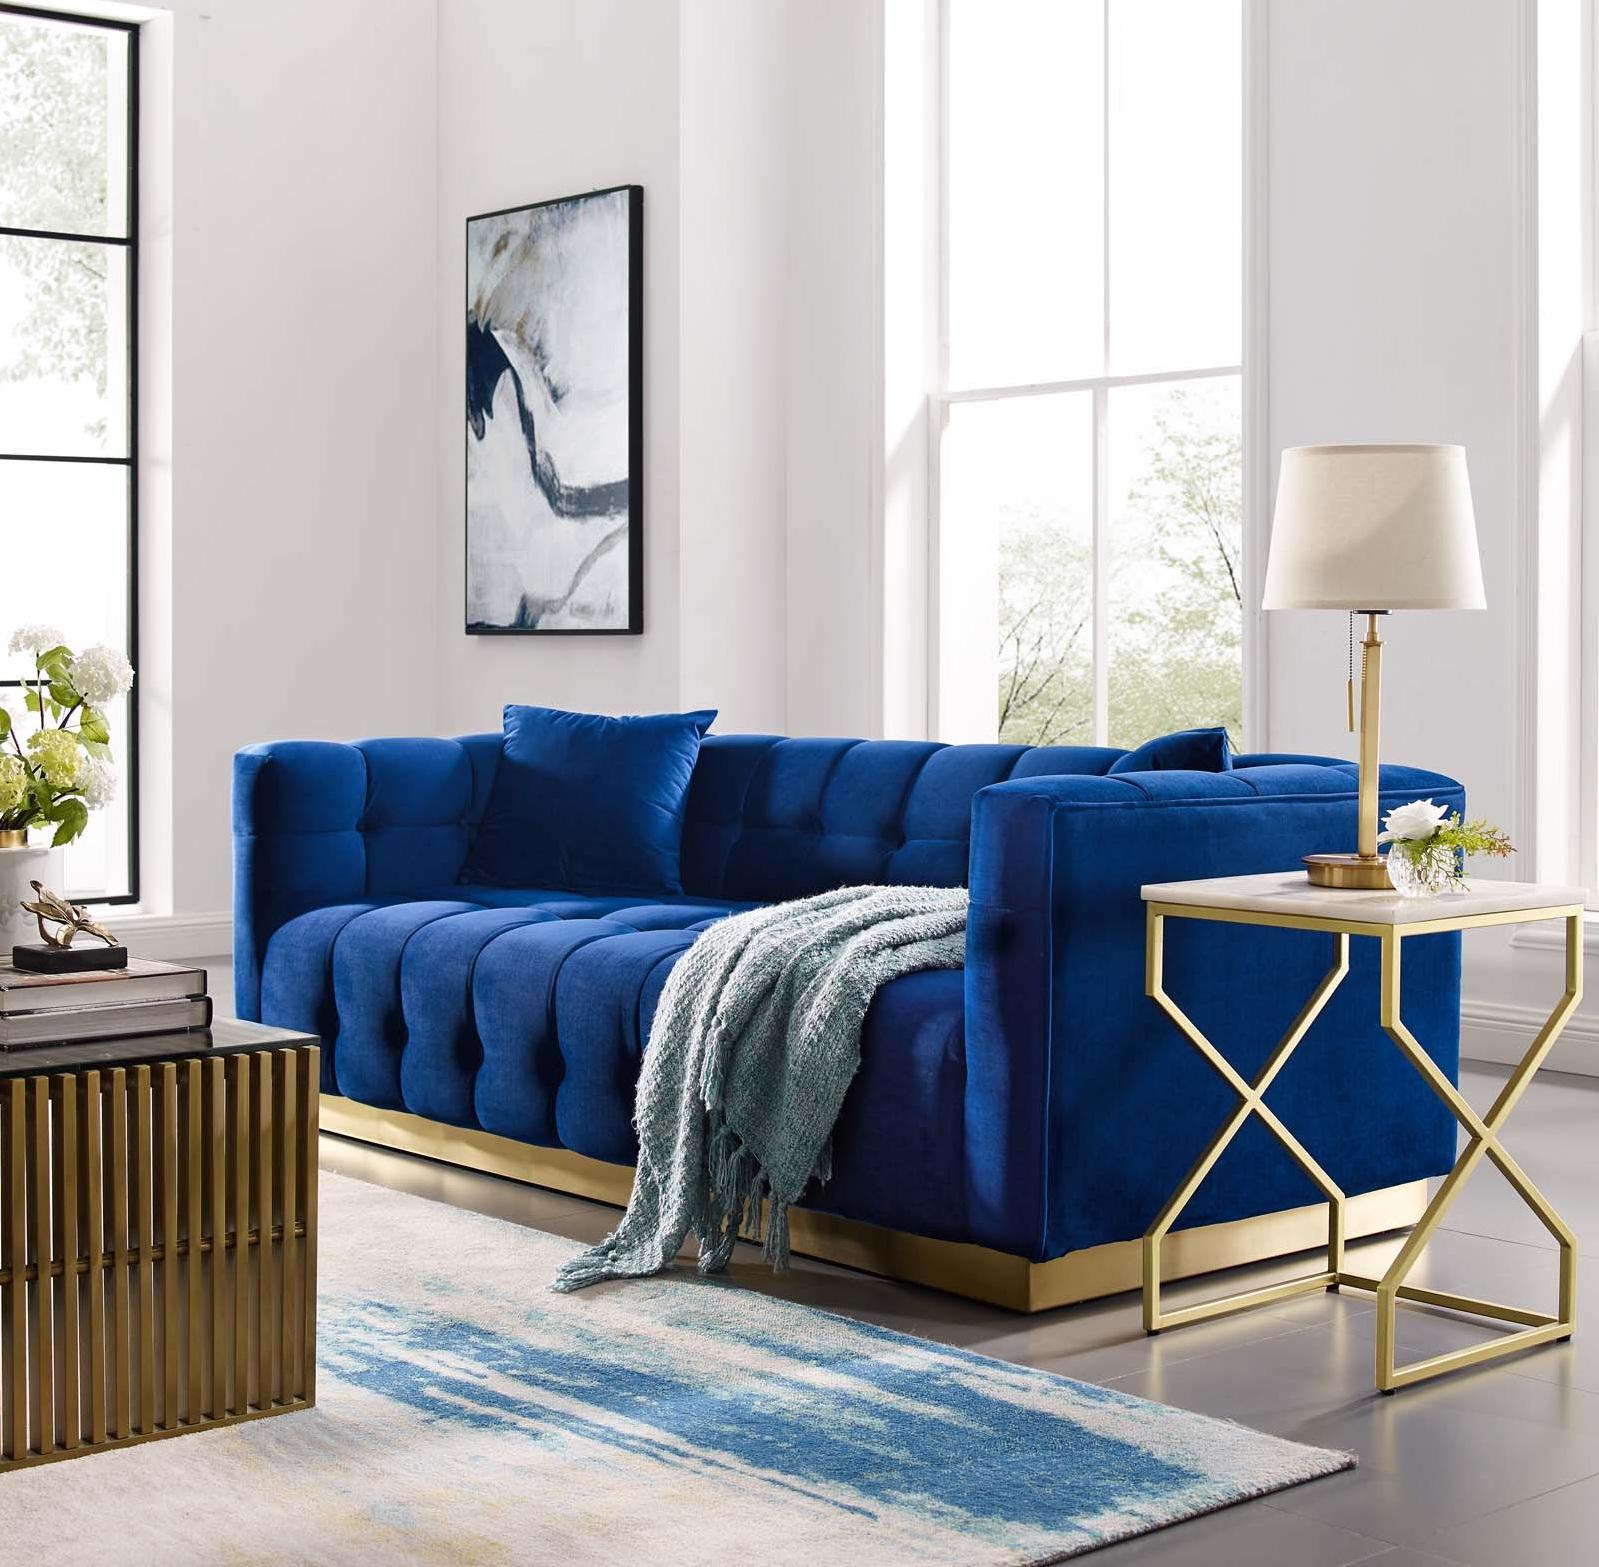 Royal Blue Sofa and Cushion Ideas 2021